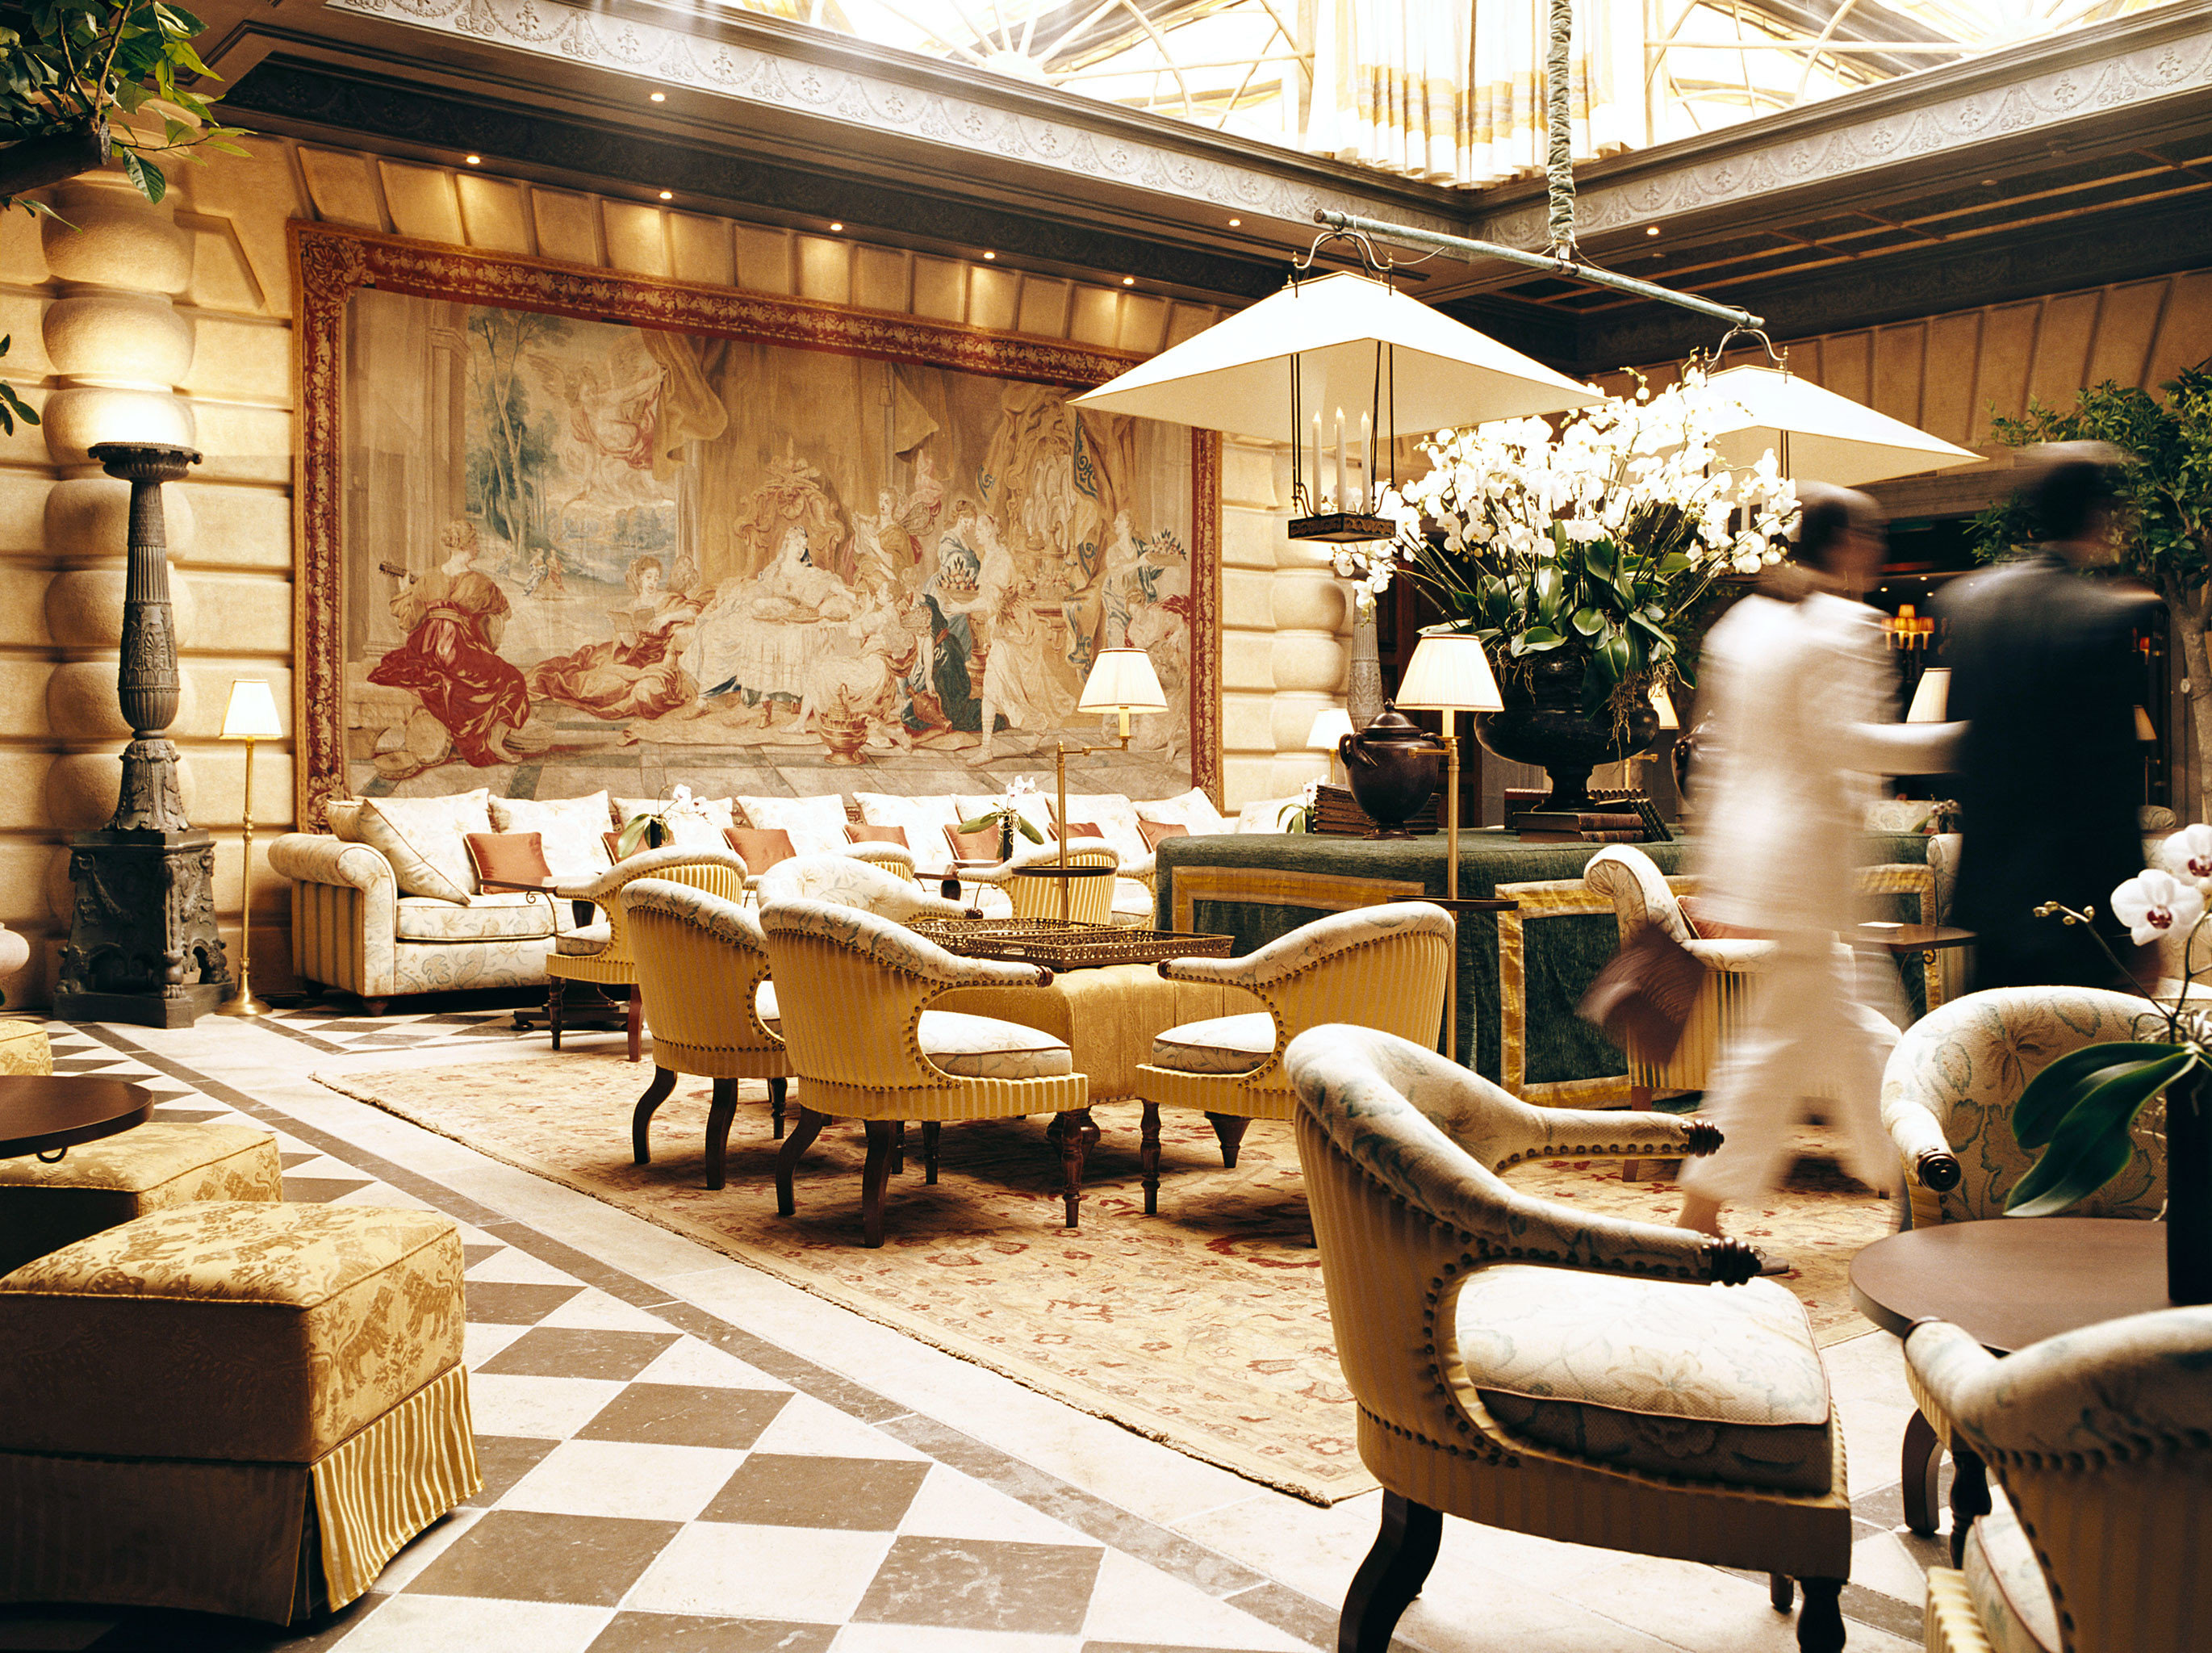 Bar Dining Drink Eat Elegant Hotels Luxury Luxury Travel Travel Tips Trip Ideas Lobby living room home restaurant